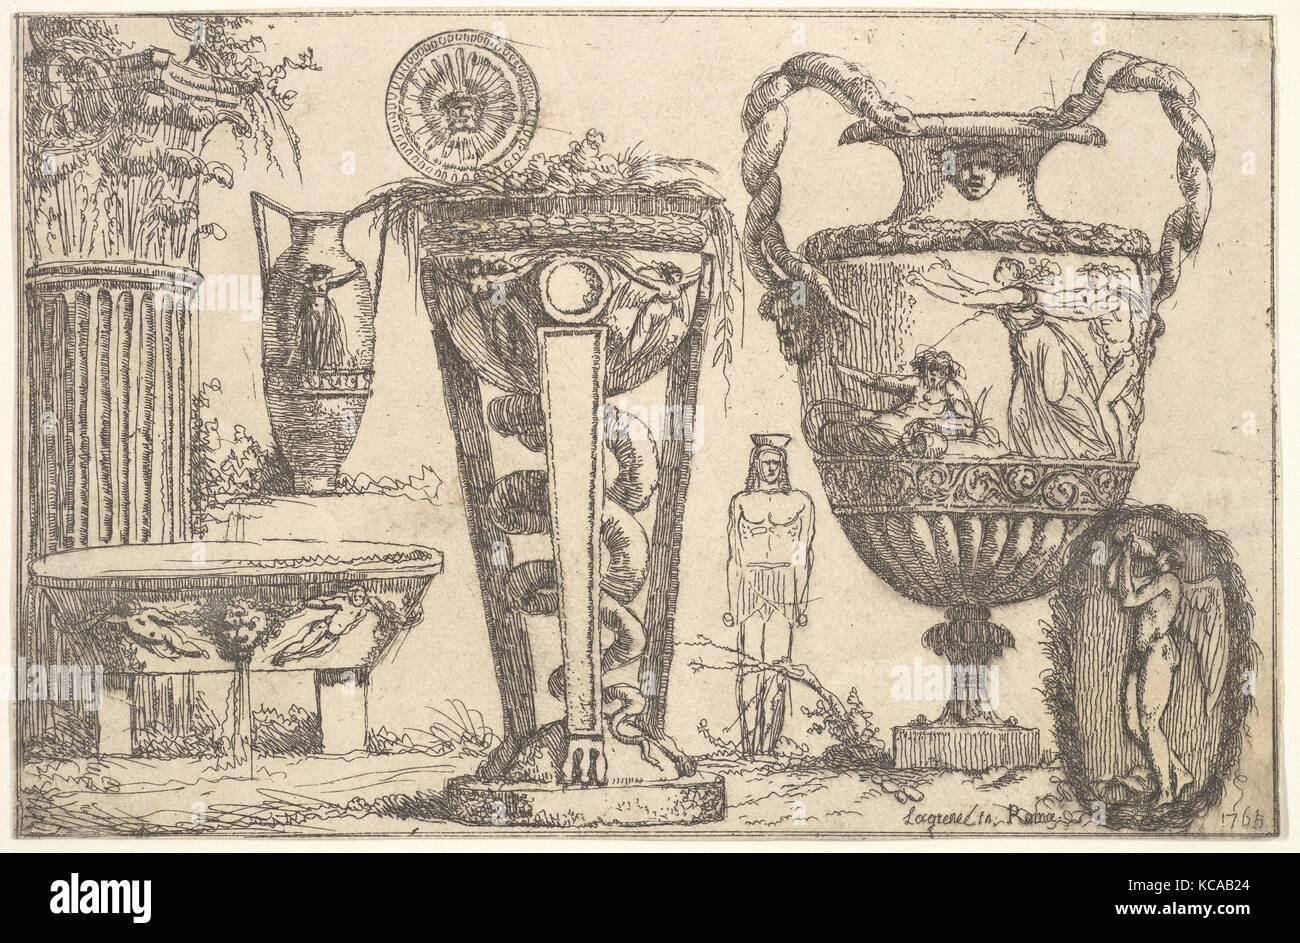 Fragments of Antiquity, Jean Jacques Lagrenée, 1765 - Stock Image